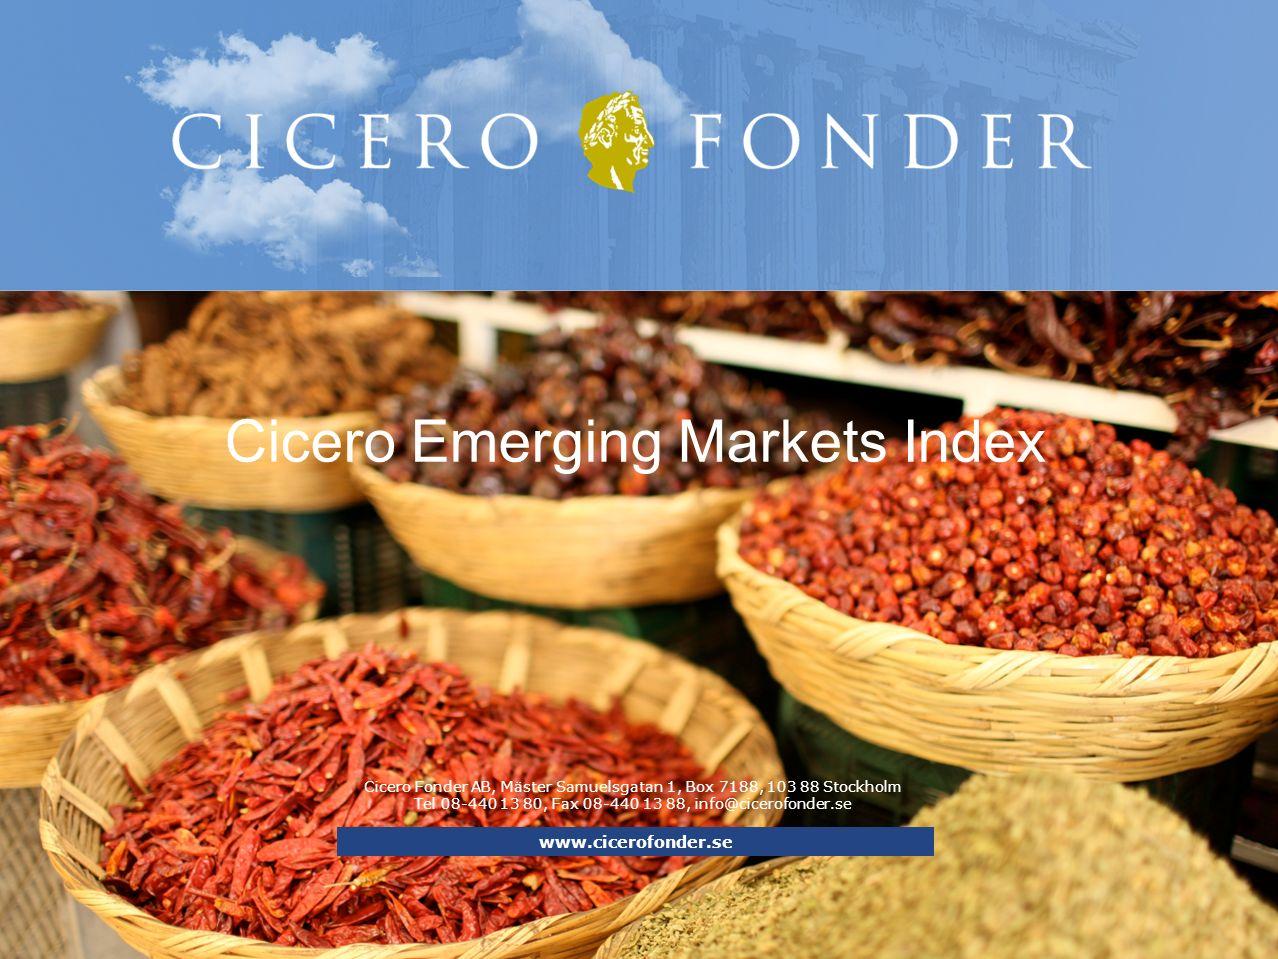 Cicero Fonder AB, Mäster Samuelsgatan 1, Box 7188, 103 88 Stockholm Tel 08-440 13 80, Fax 08-440 13 88, info@cicerofonder.se Cicero Emerging Markets Index www.cicerofonder.se